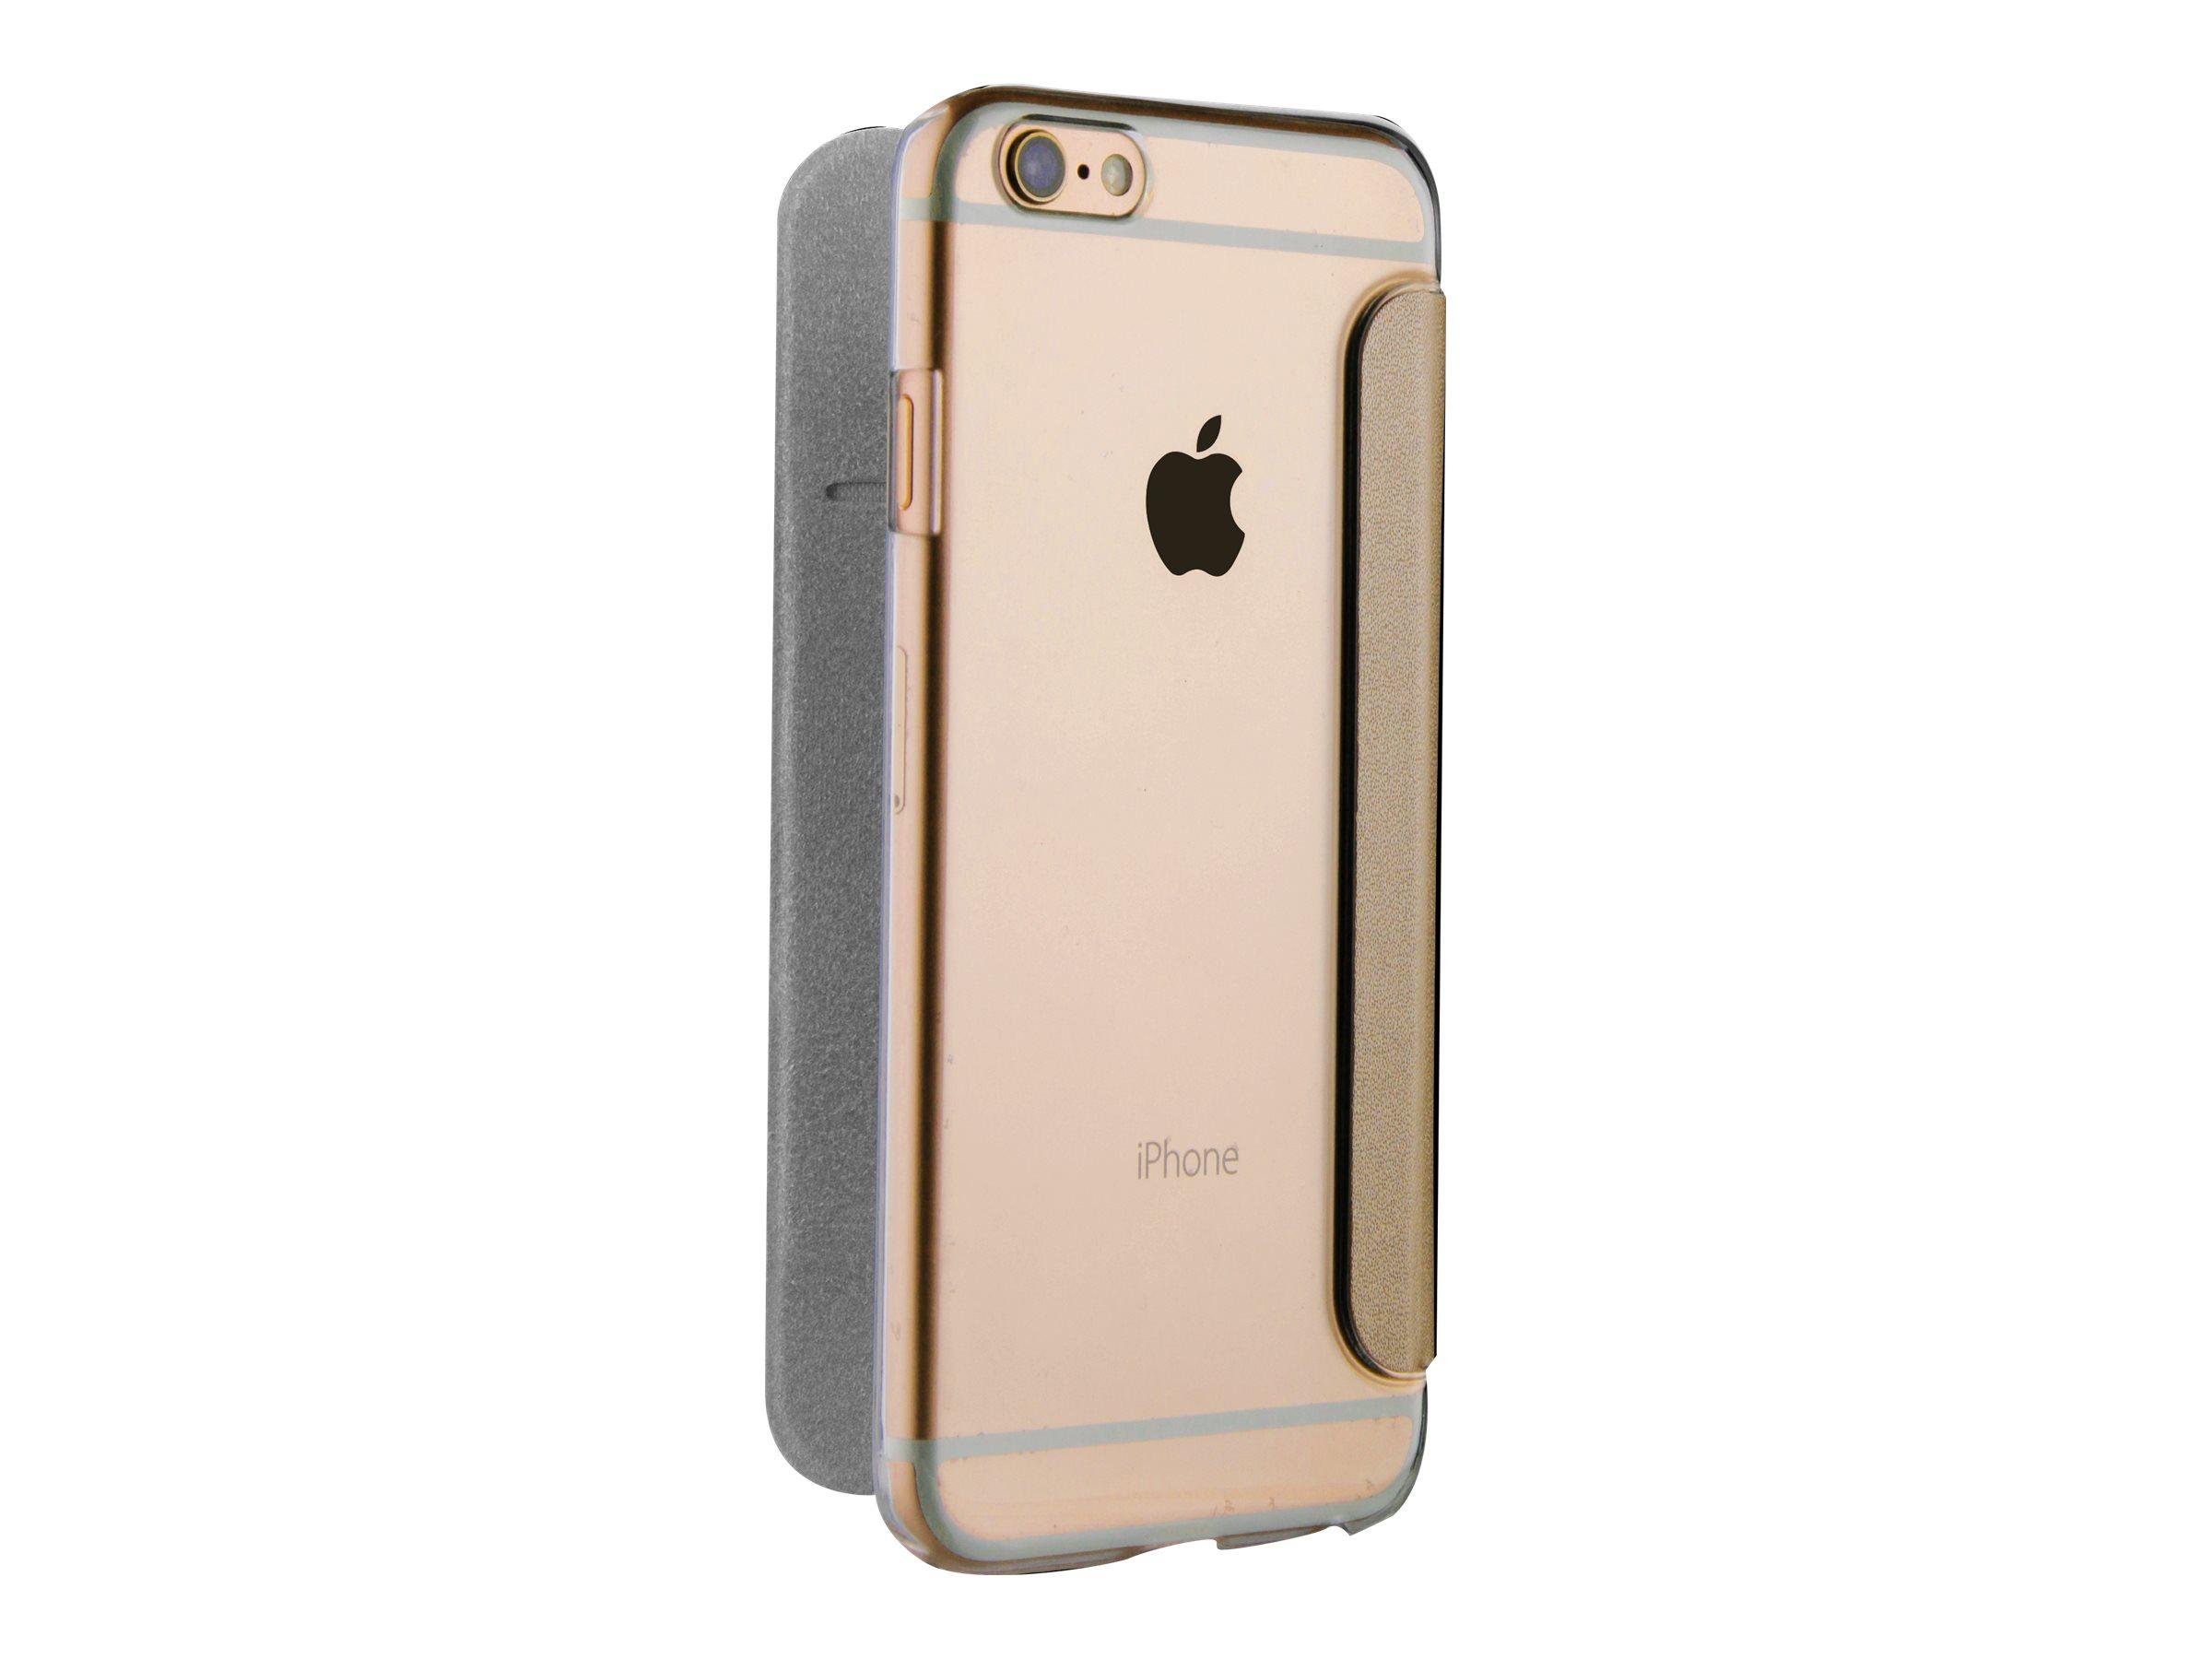 Muvit Folio - Protection à rabat pour iPhone 7 Plus - or